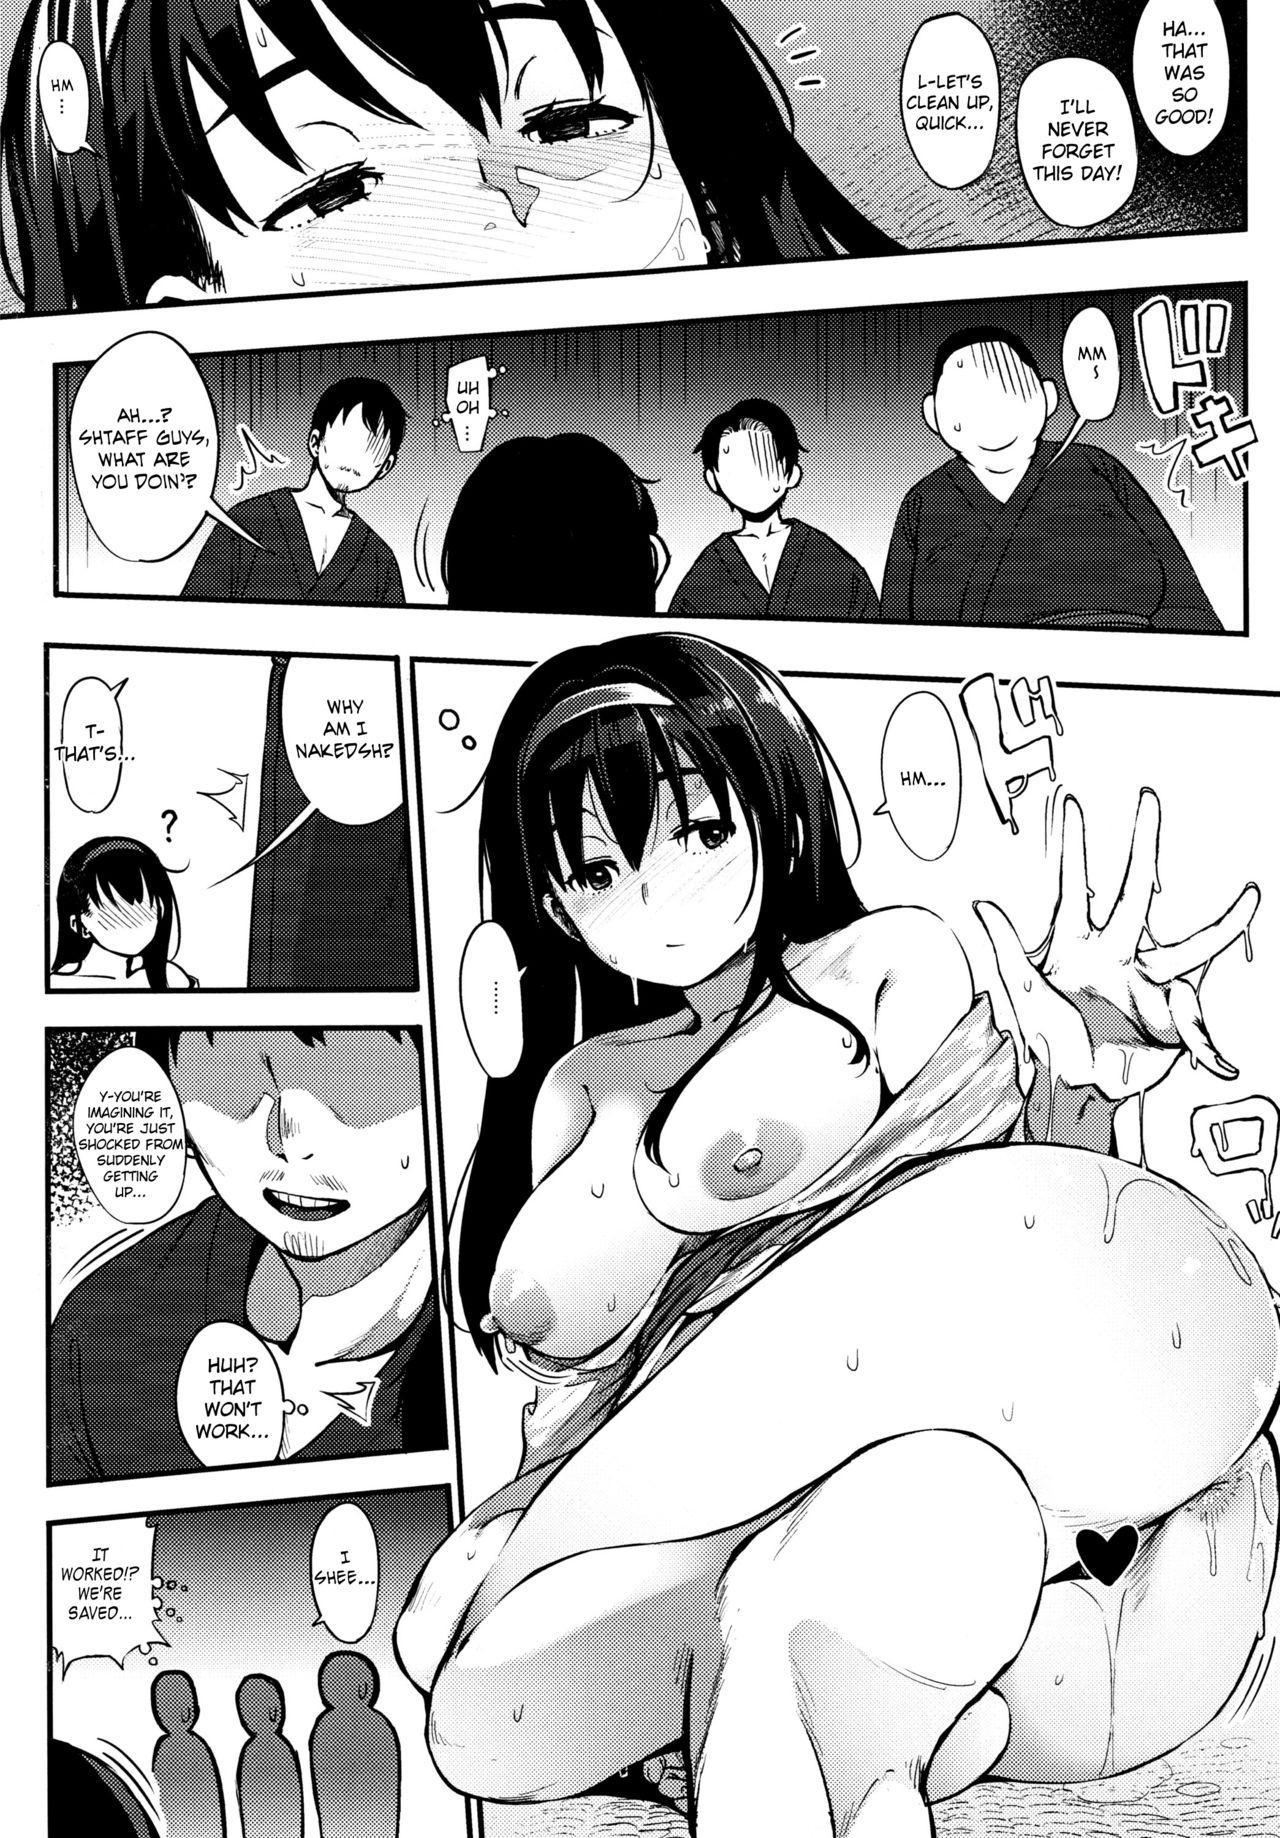 Girigiri Idol 2 7